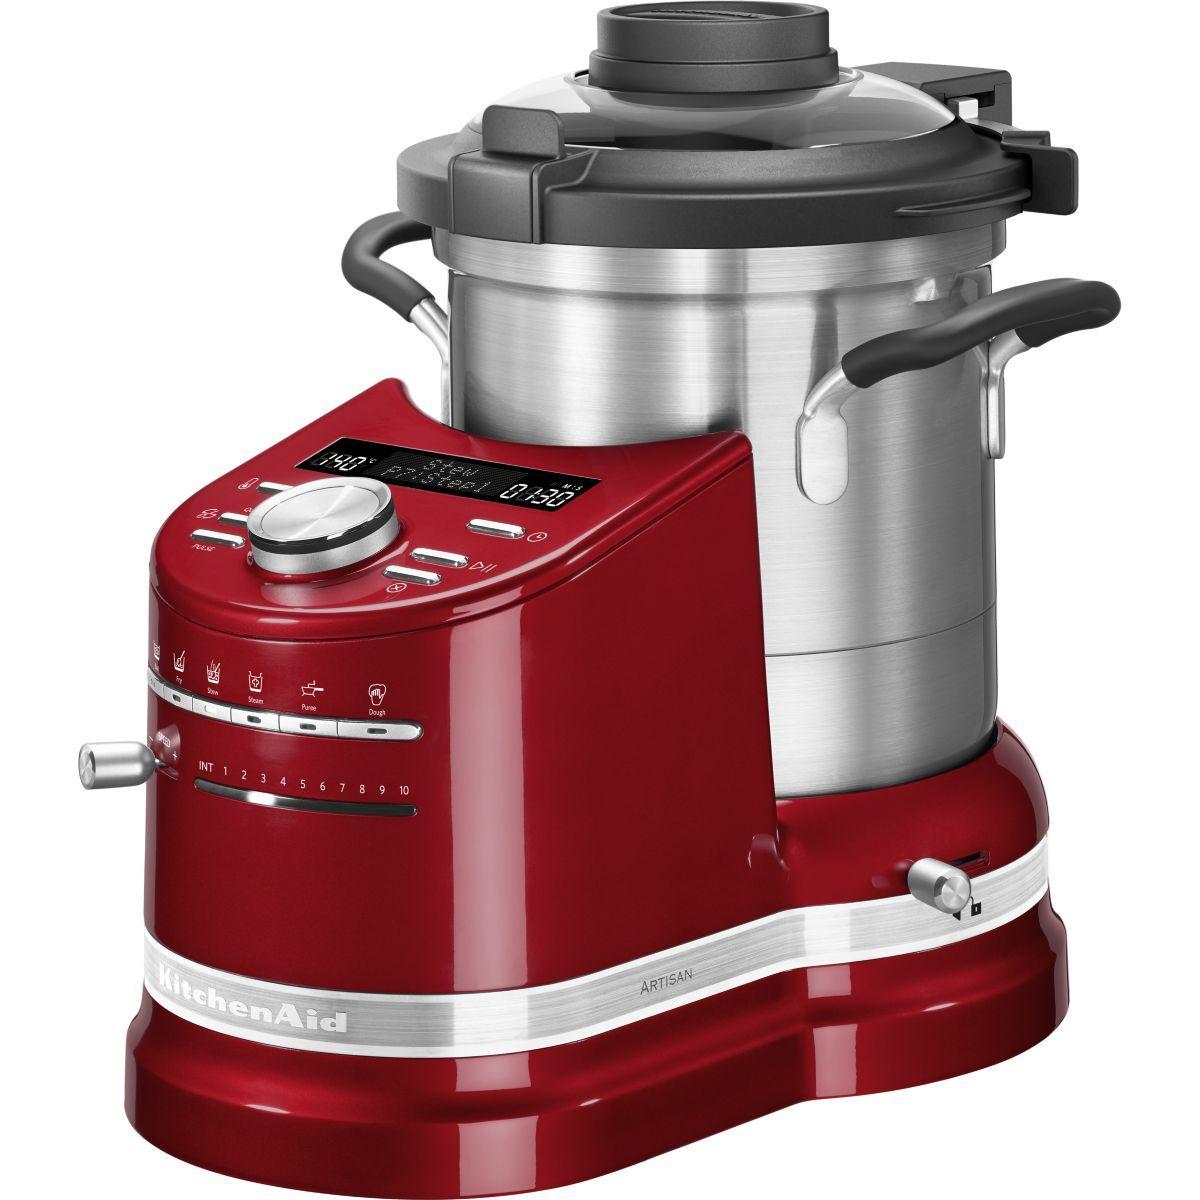 Robot KITCHENAID Cook Processor 5KCF0104